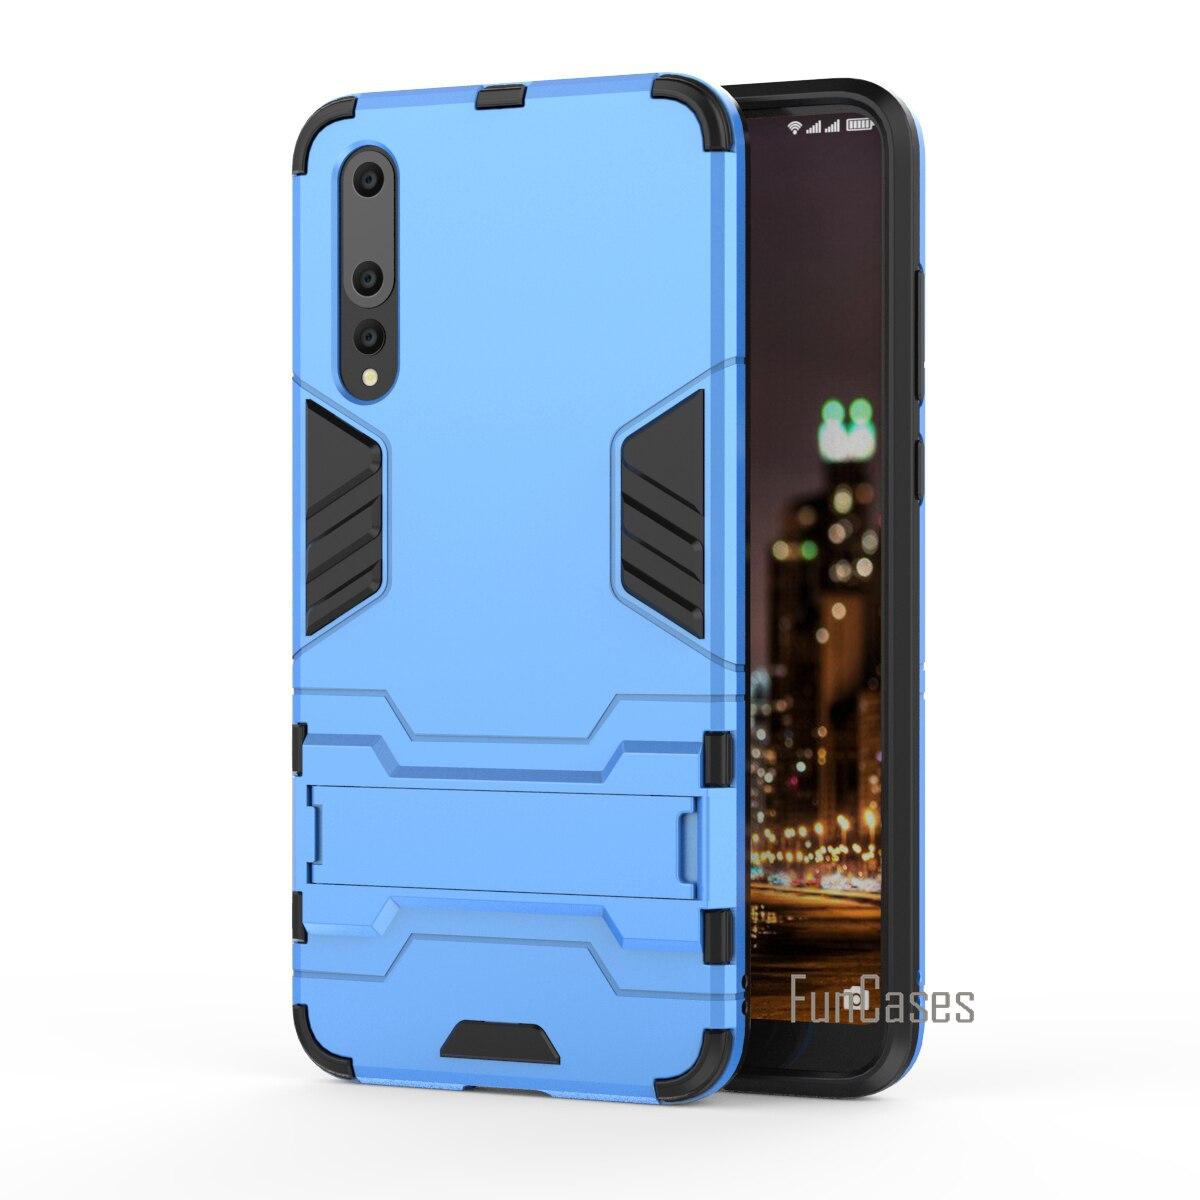 Funda de teléfono de protección fuerte para Huawei P20 Pro Coque Armor...